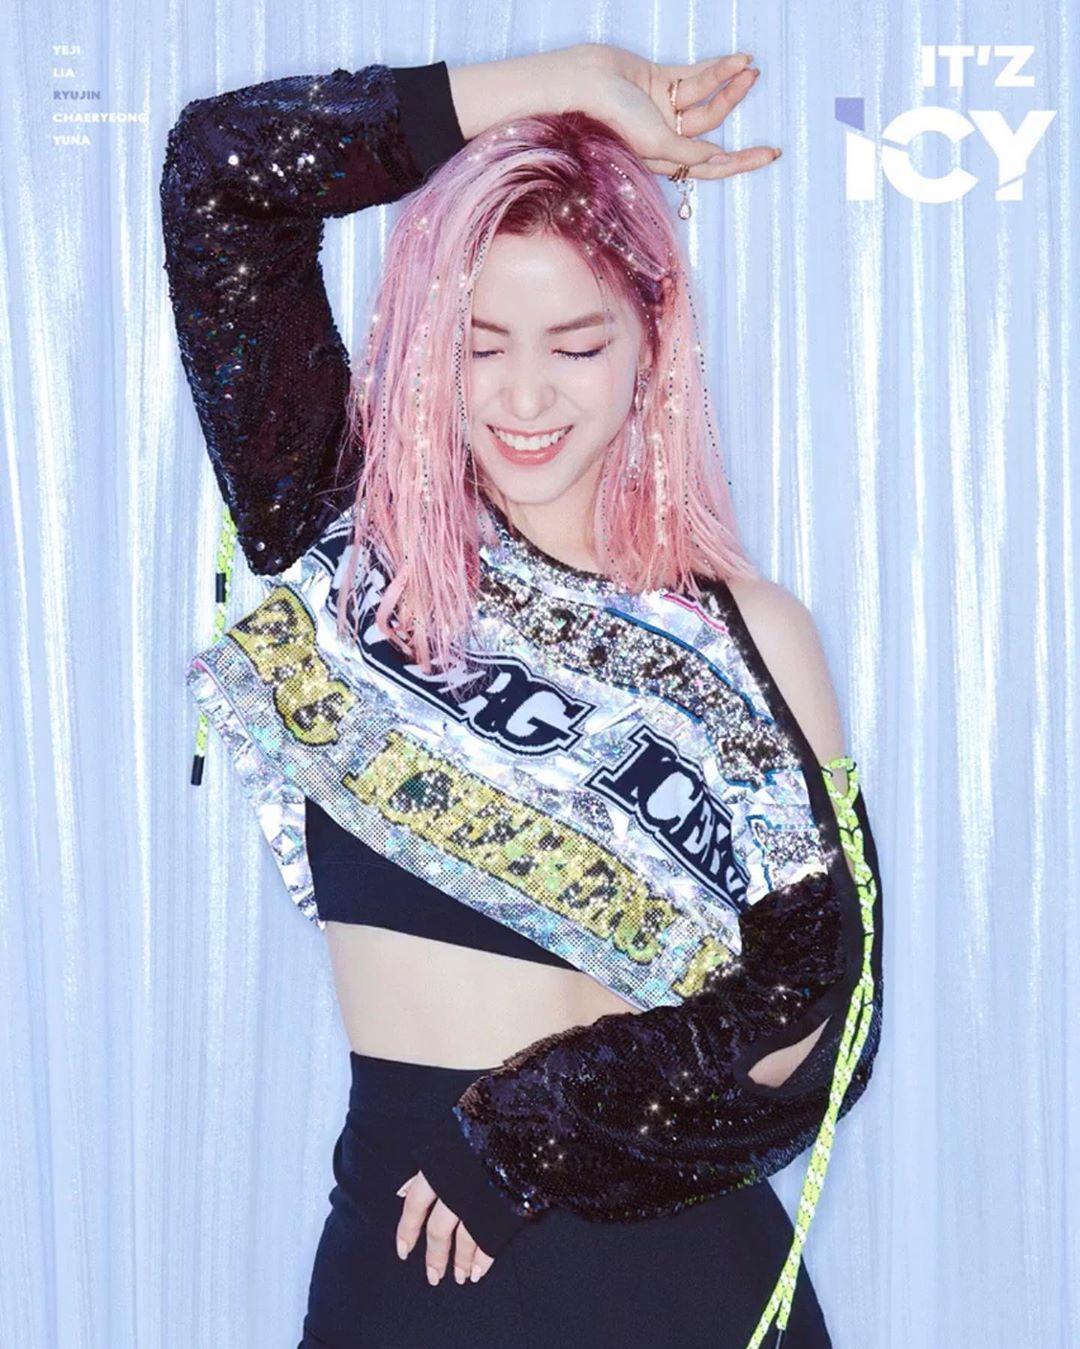 Pin By Karen Rodriguez On Itzy In 2019 Kpop Kpop Girl